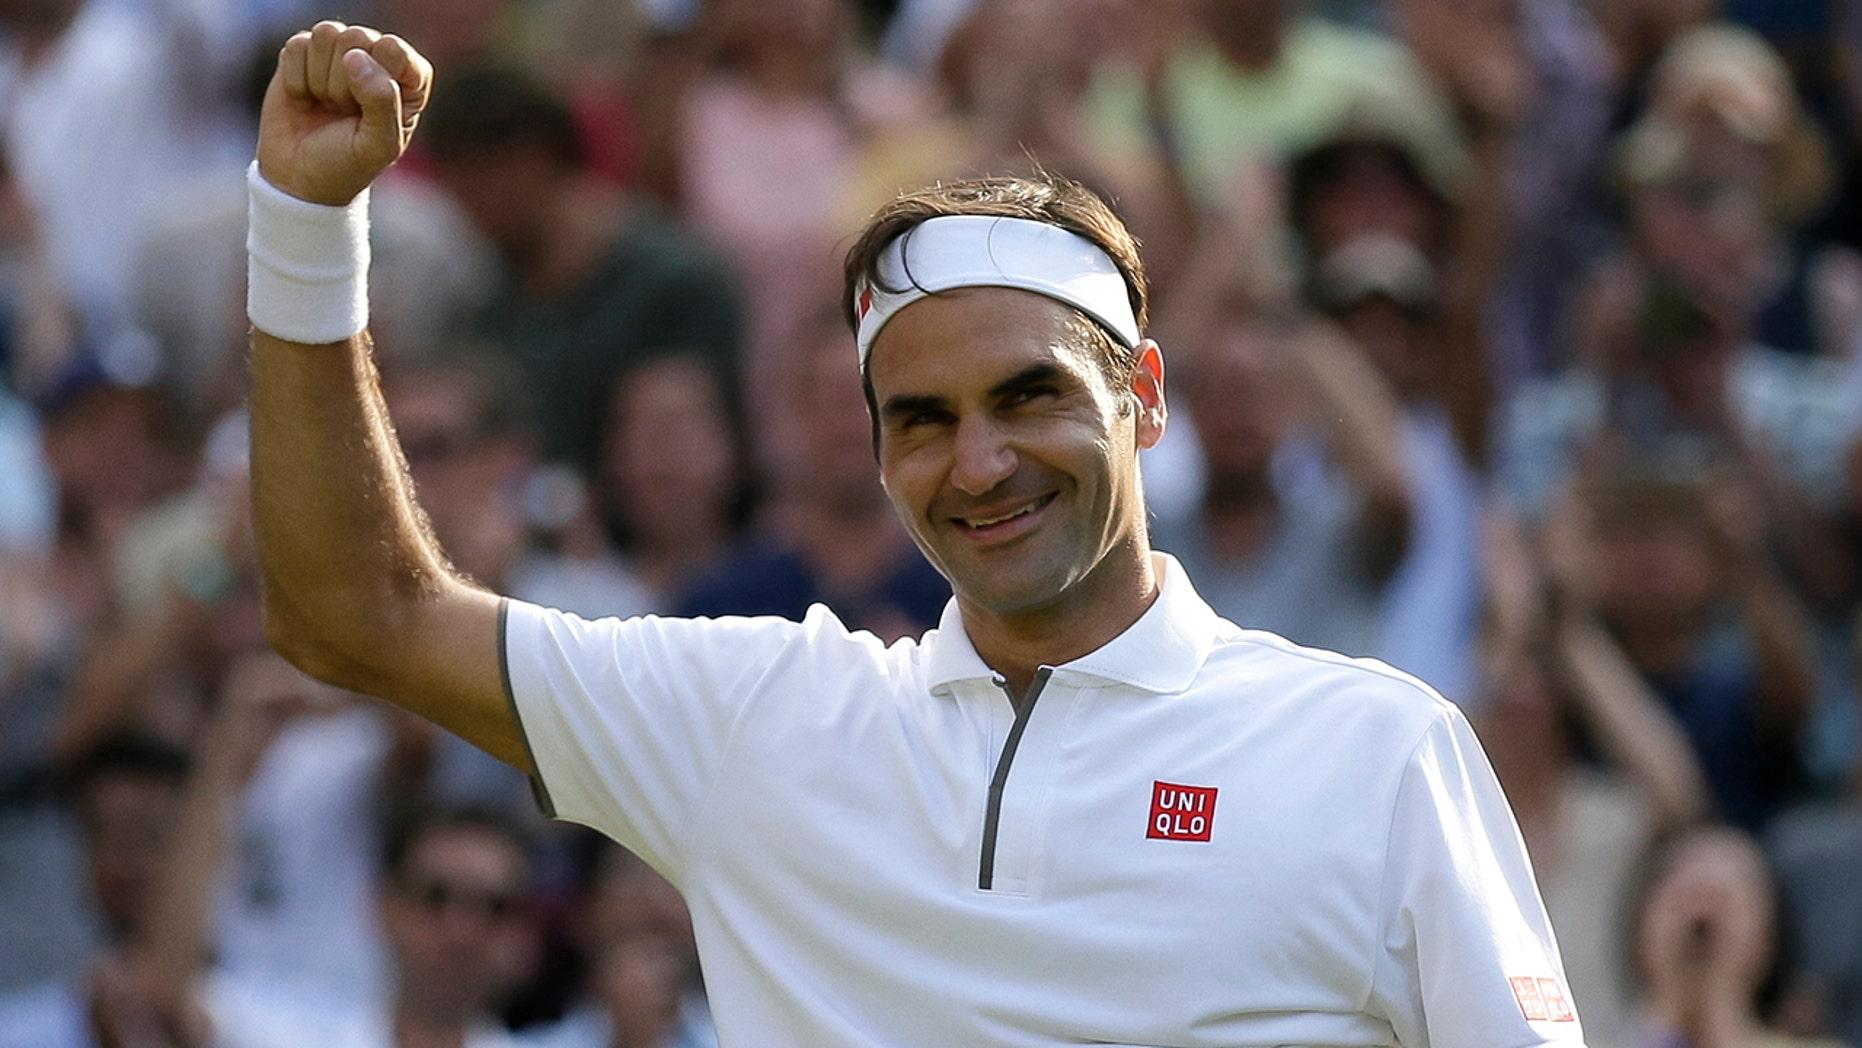 Switzerland's Roger Federer celebrates defeating Japan's Kei Nishikori during a men's quarterfinal match on day nine of the Wimbledon Tennis Championships in London, Wednesday, July 10, 2019. (AP Photo/Tim Ireland)